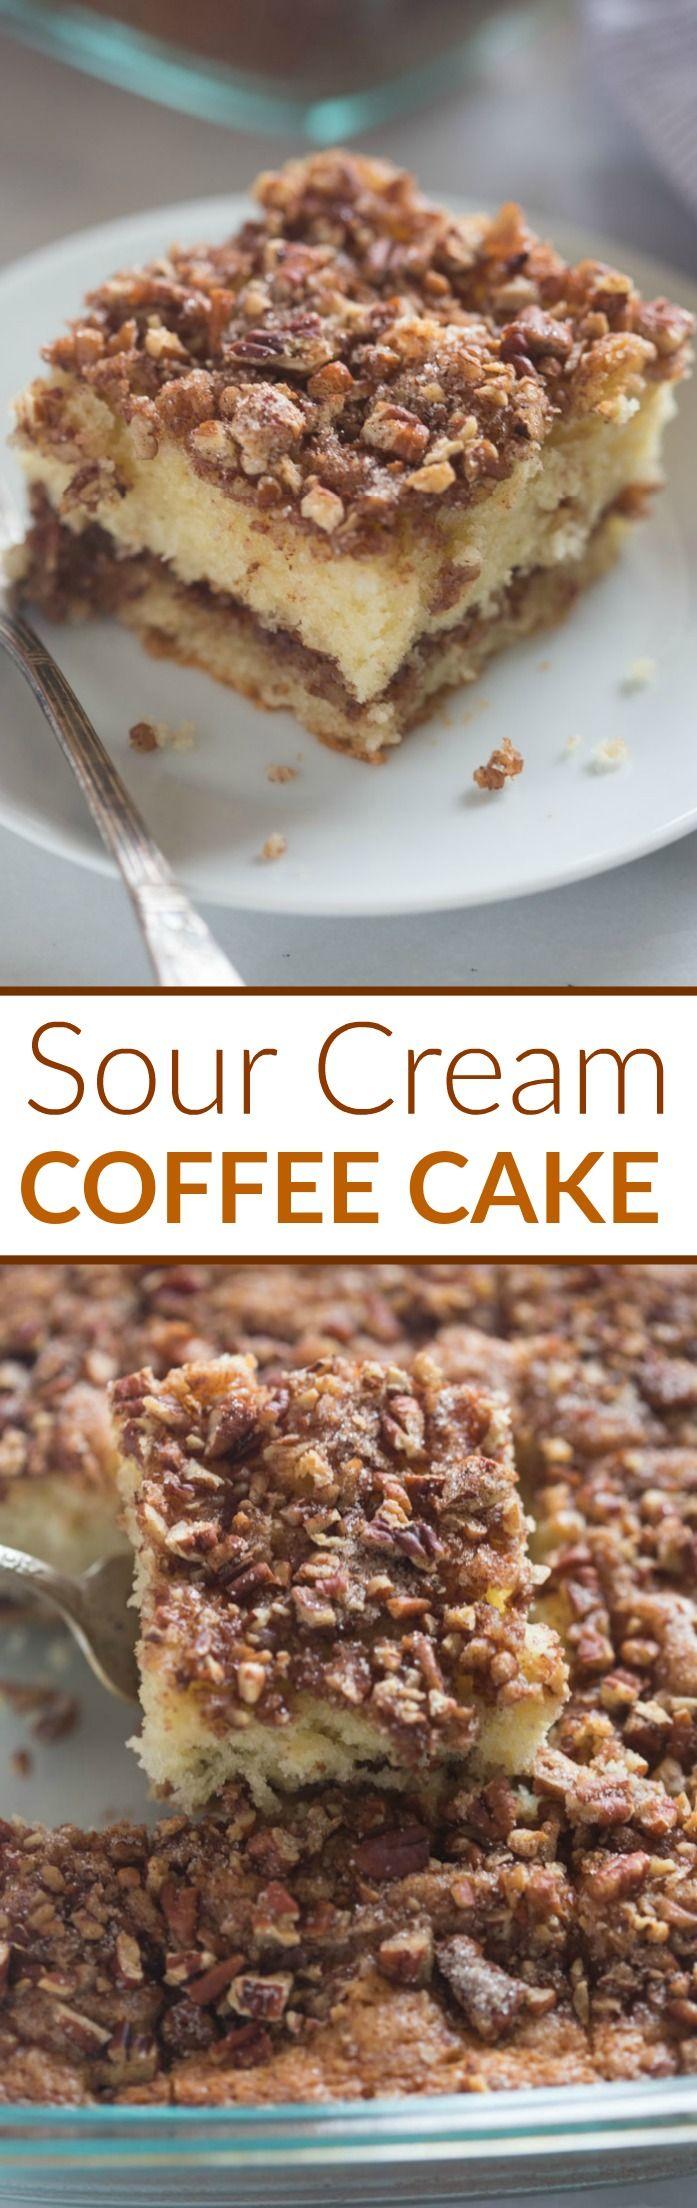 Sour Cream Coffee Cake Recipe Coffee Cake Recipes Desserts Baking